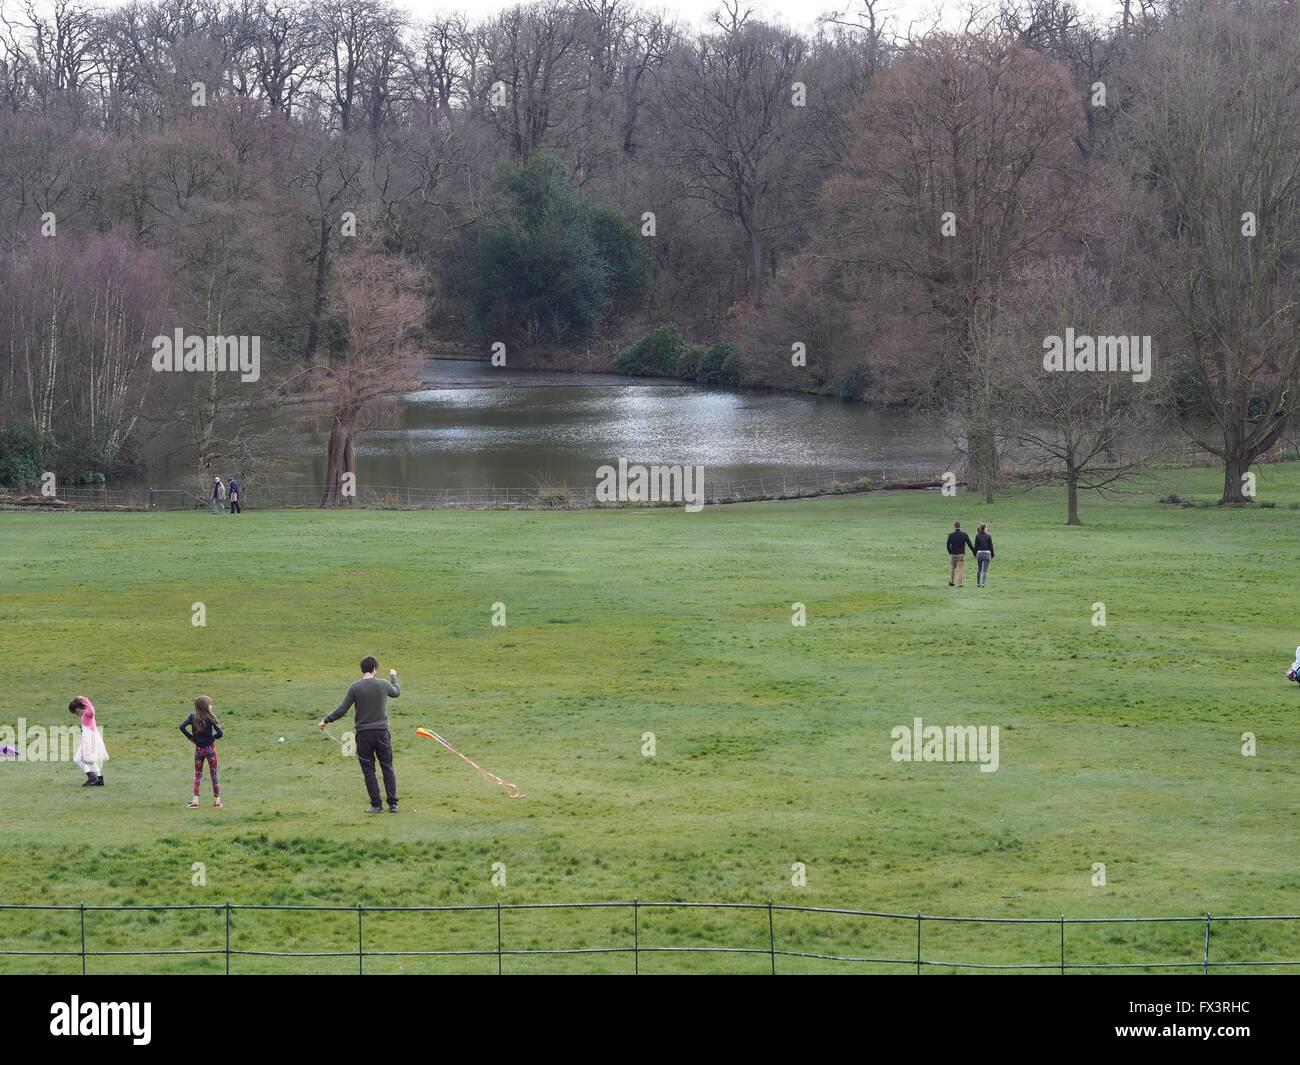 park, parks, Kenwood House, Hampstead, West Hampstead, Park, parks, family, people - Stock Image